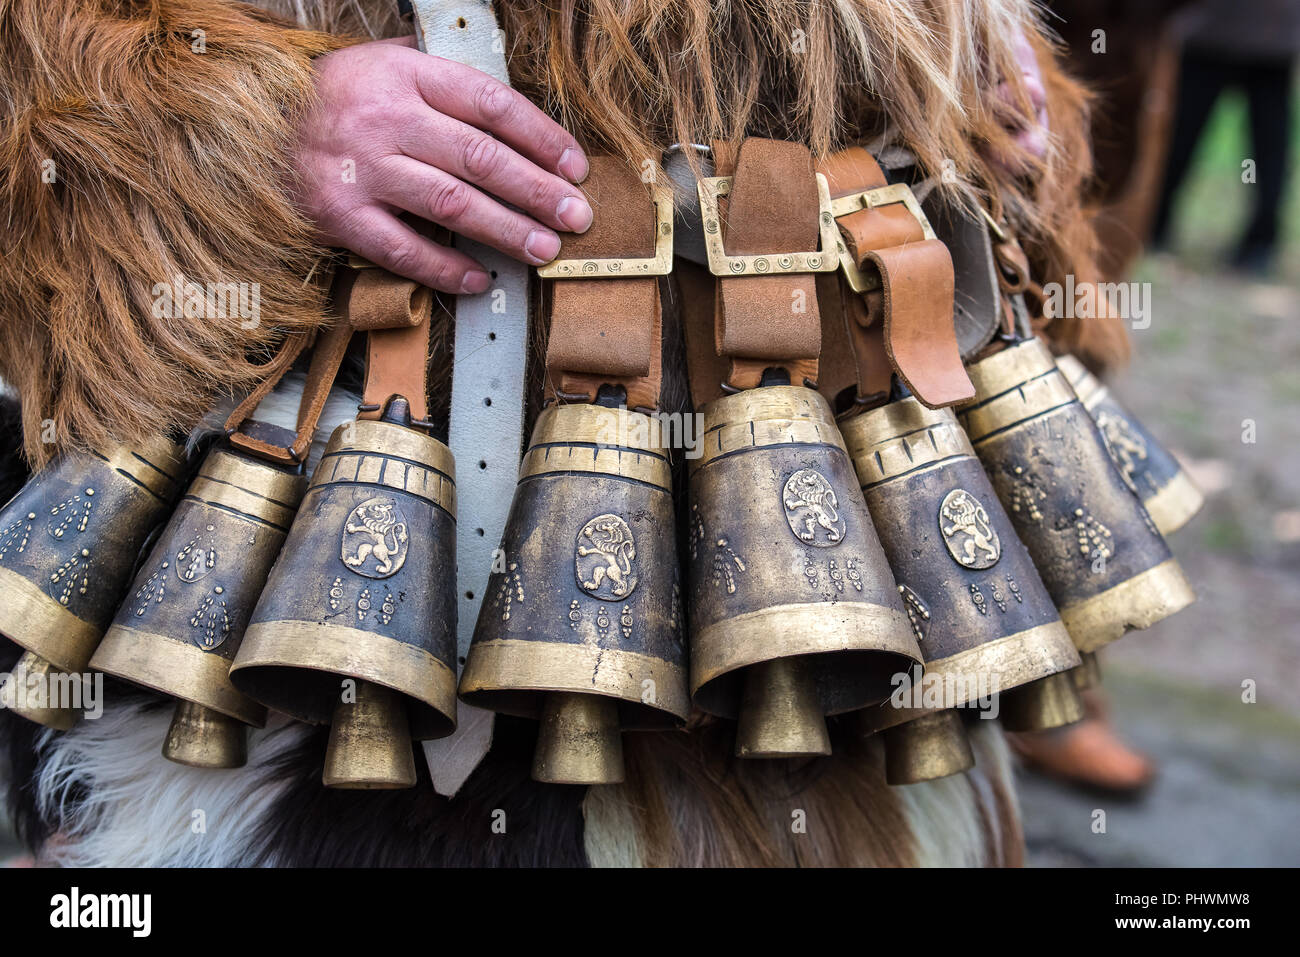 Kukeri campanas. Trajes de Kukeri Folk en Bulgaria. Foto de stock